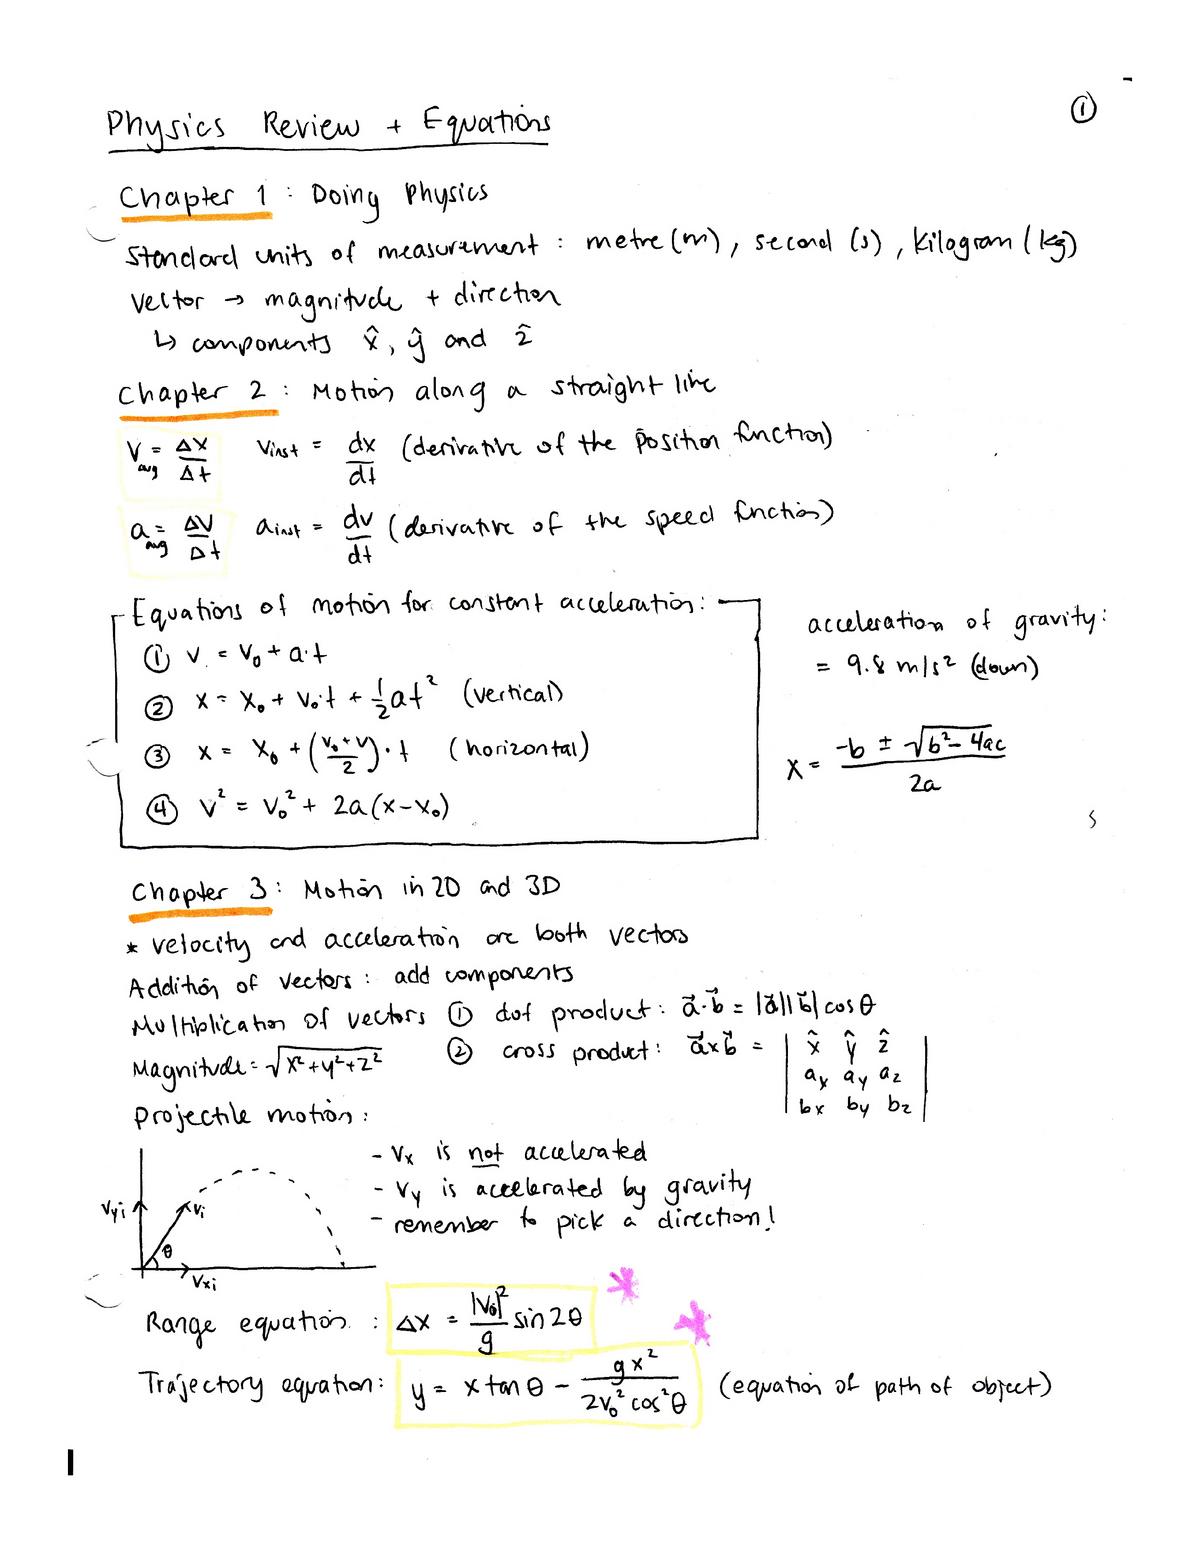 Physics Study Sheets - 1401/2: Physics - StuDocu